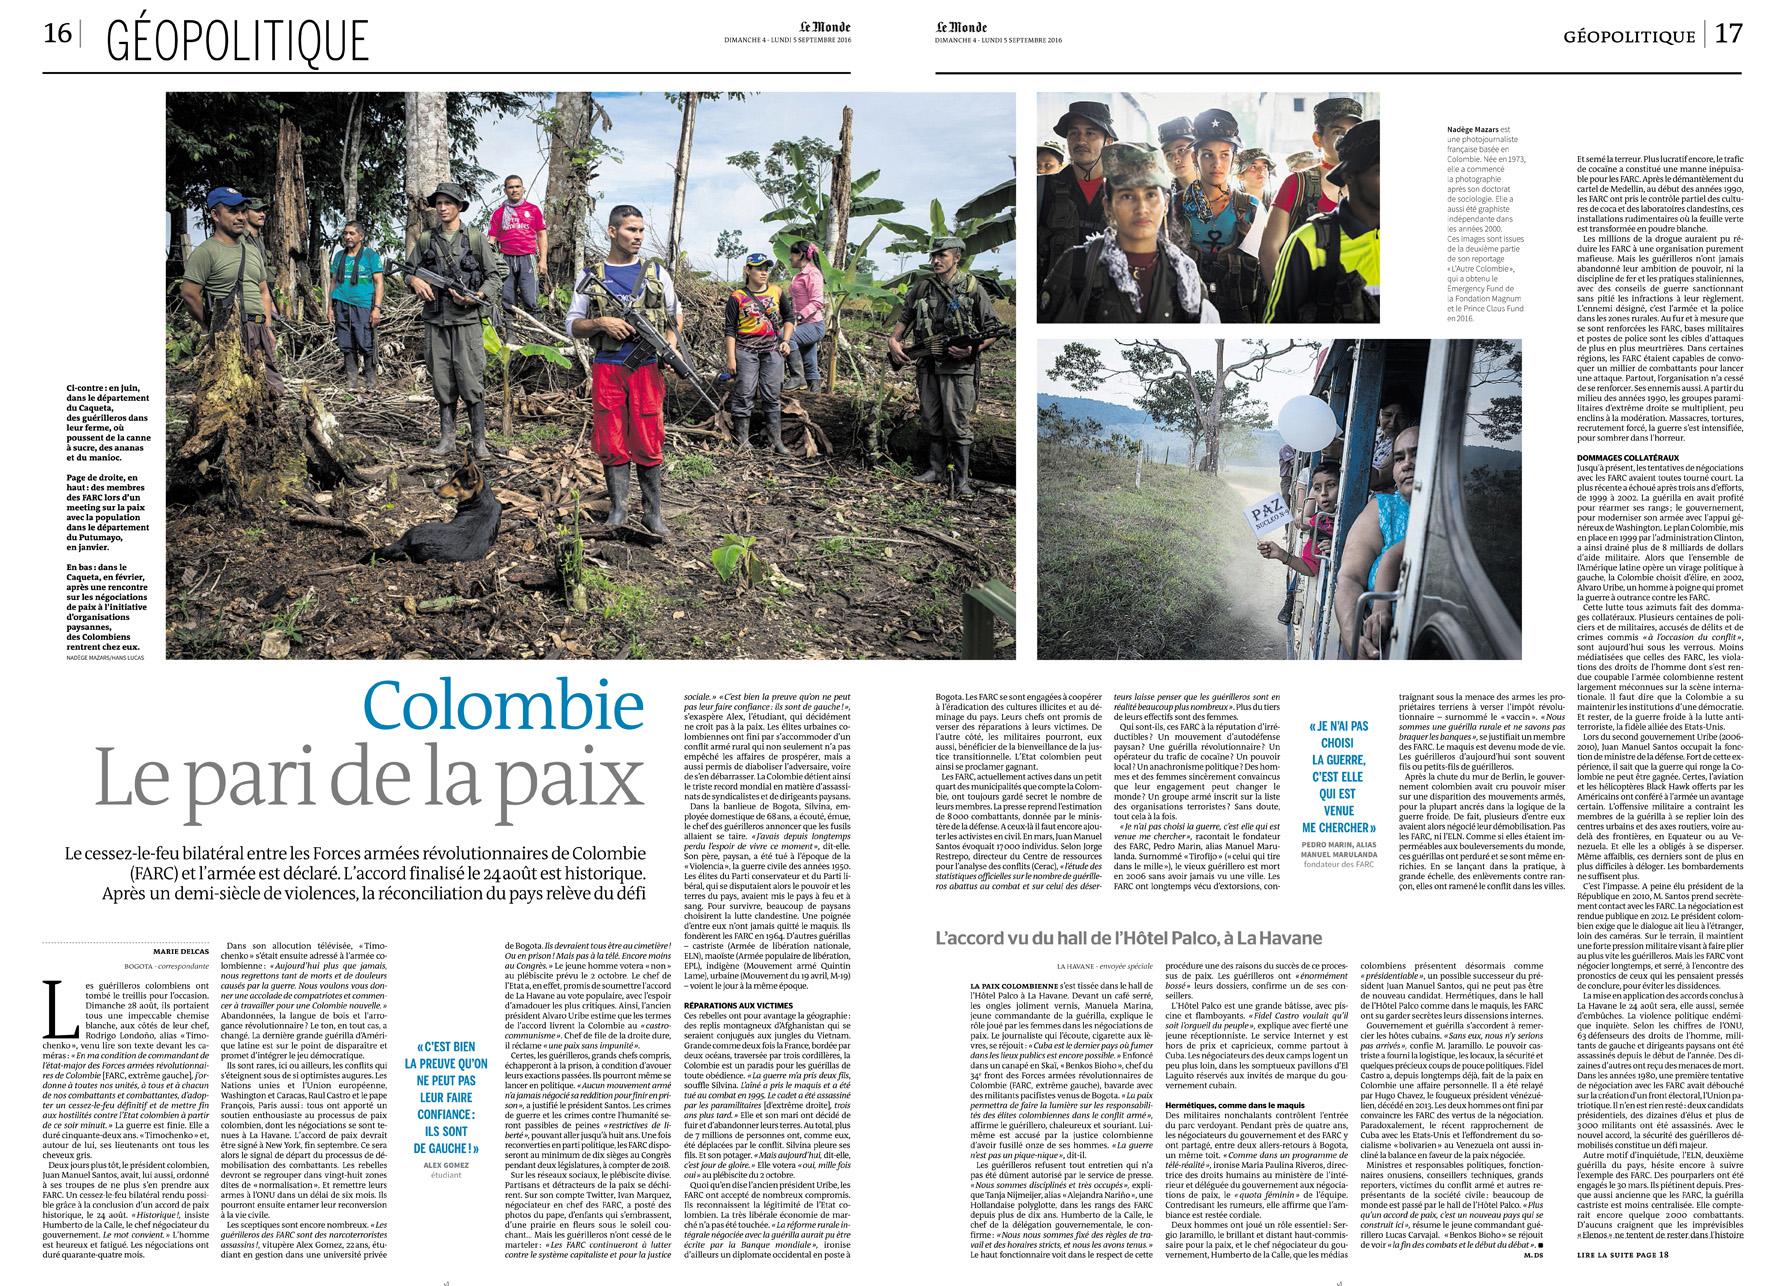 2016-09_Le_Monde_FARC.jpg